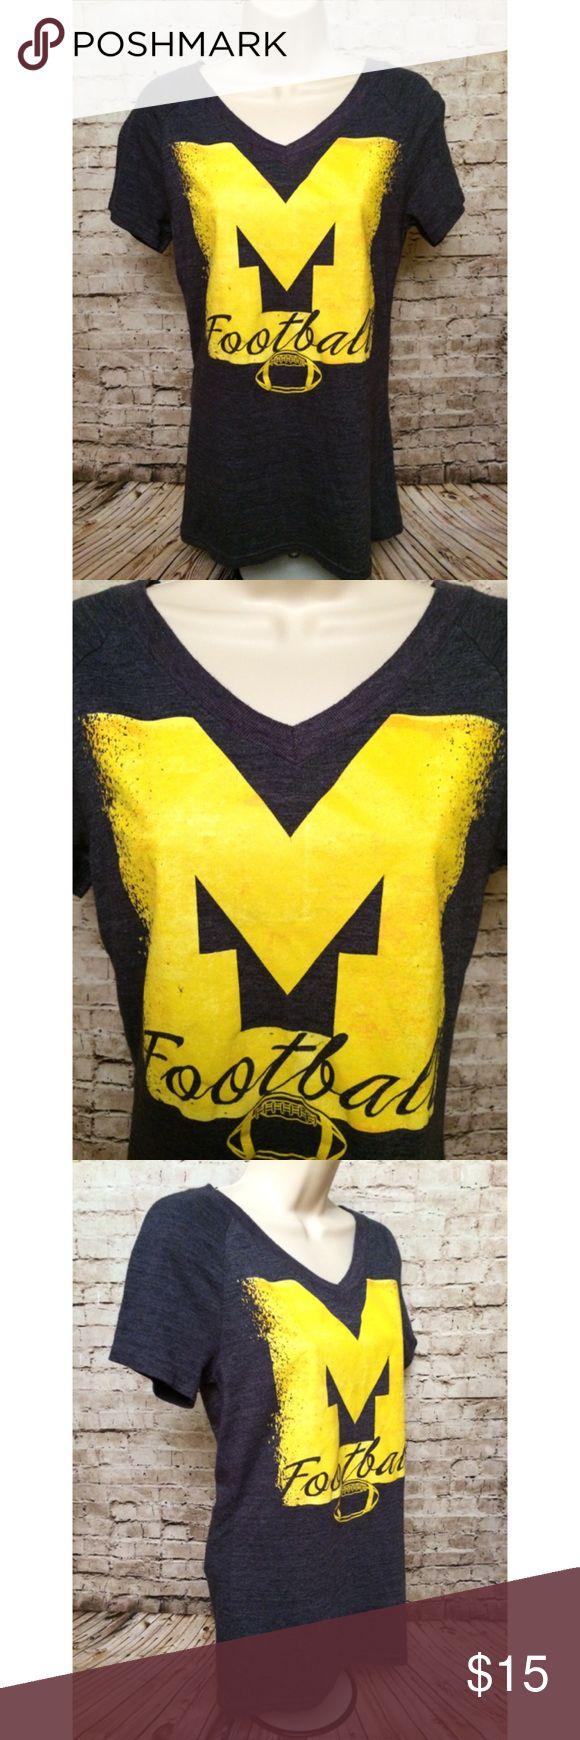 Adidas University of Michigan football t-shirt Adidas University of Michigan football t-shirt.  Sz medium.  Smoke free home Adidas Tops Tees - Short Sleeve